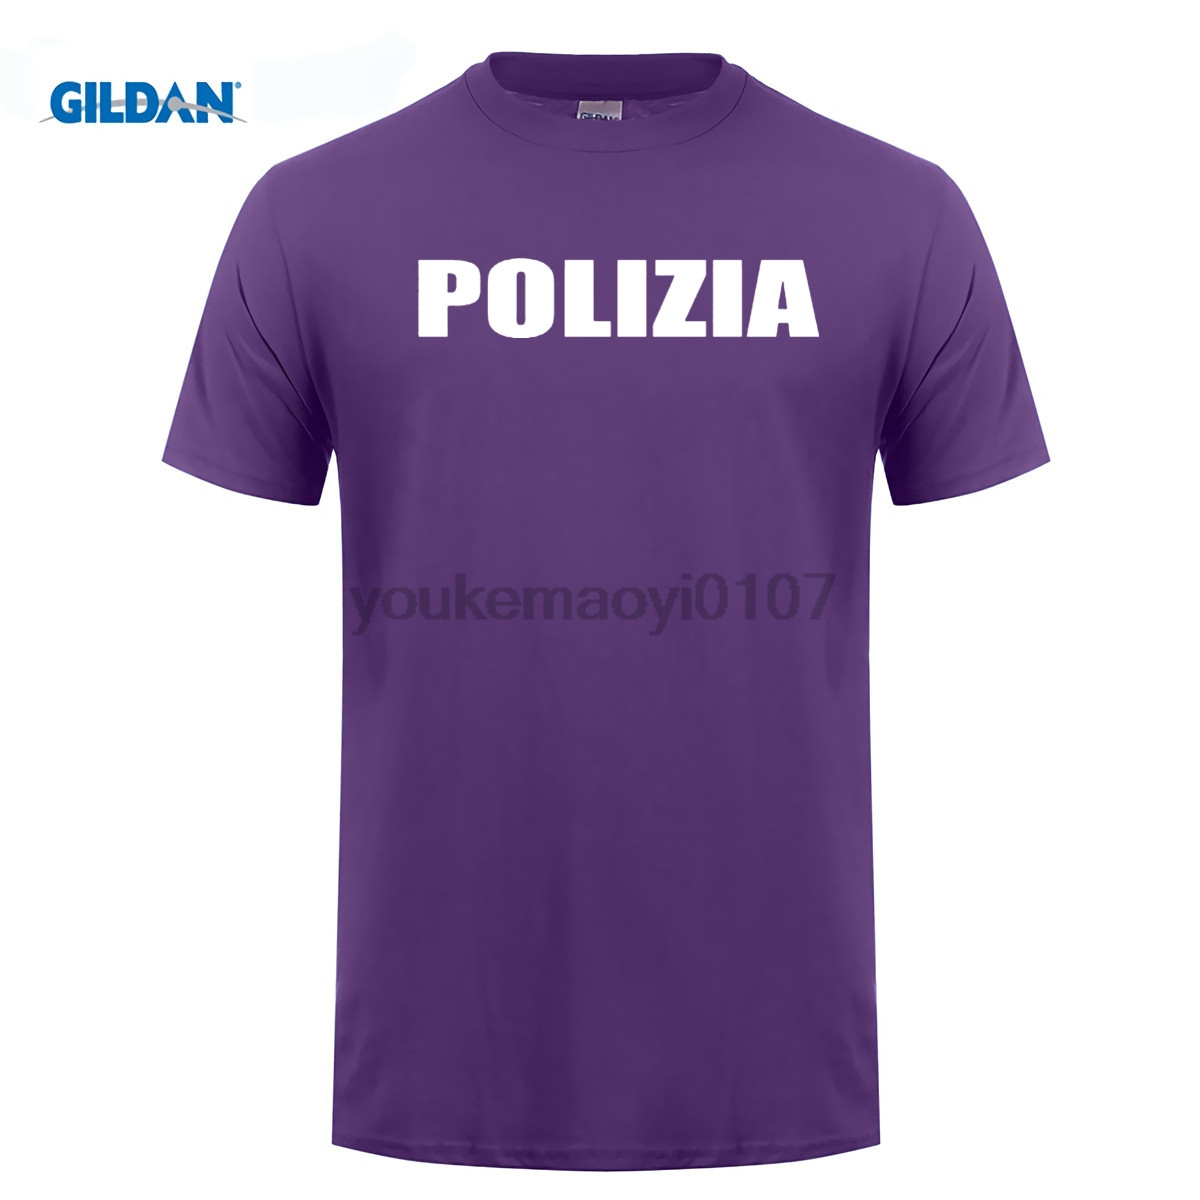 GILDAN T-Shirt Shop Short Sleeve Printing Machine O-Neck Mens Polizia Italian State Italy Novelty Fun T Shirts